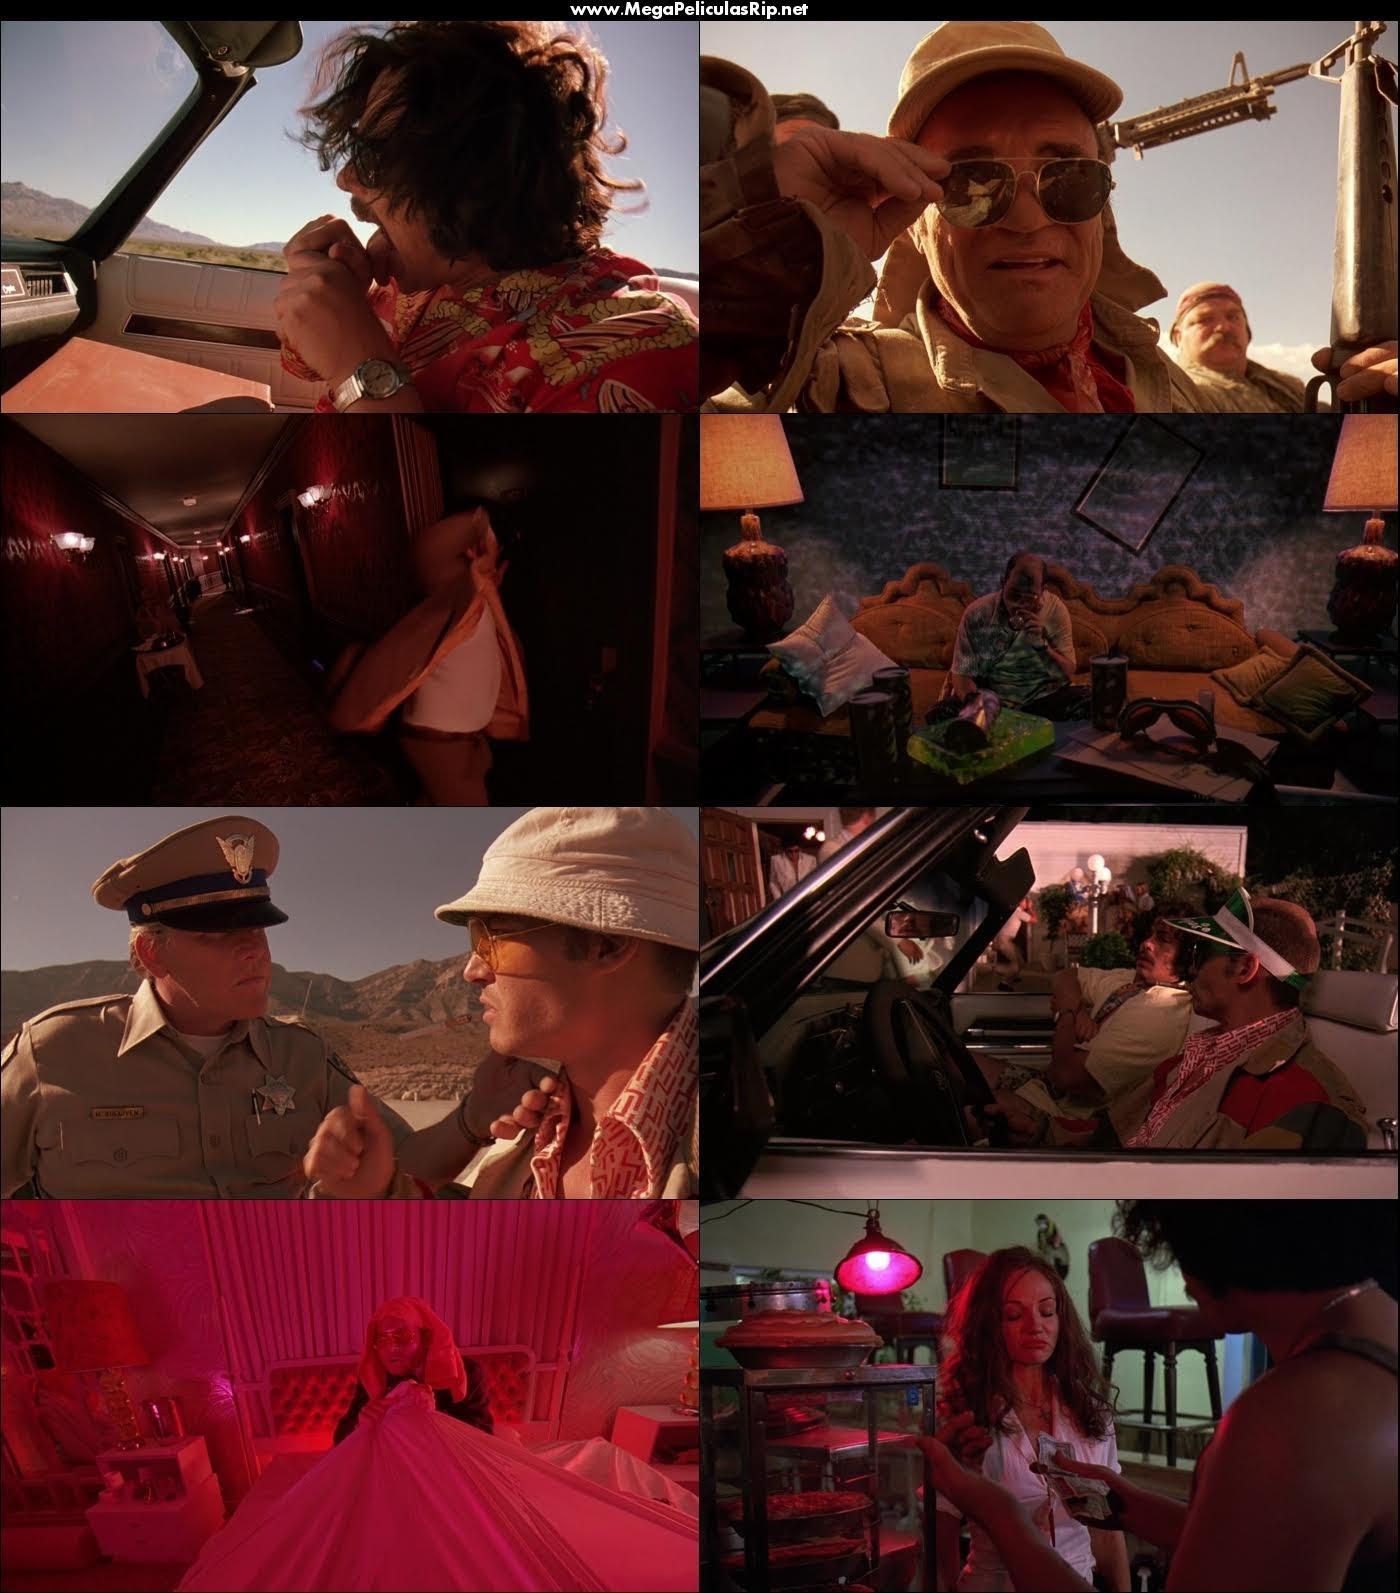 Panico Y Locura En Las Vegas 1080p Latino